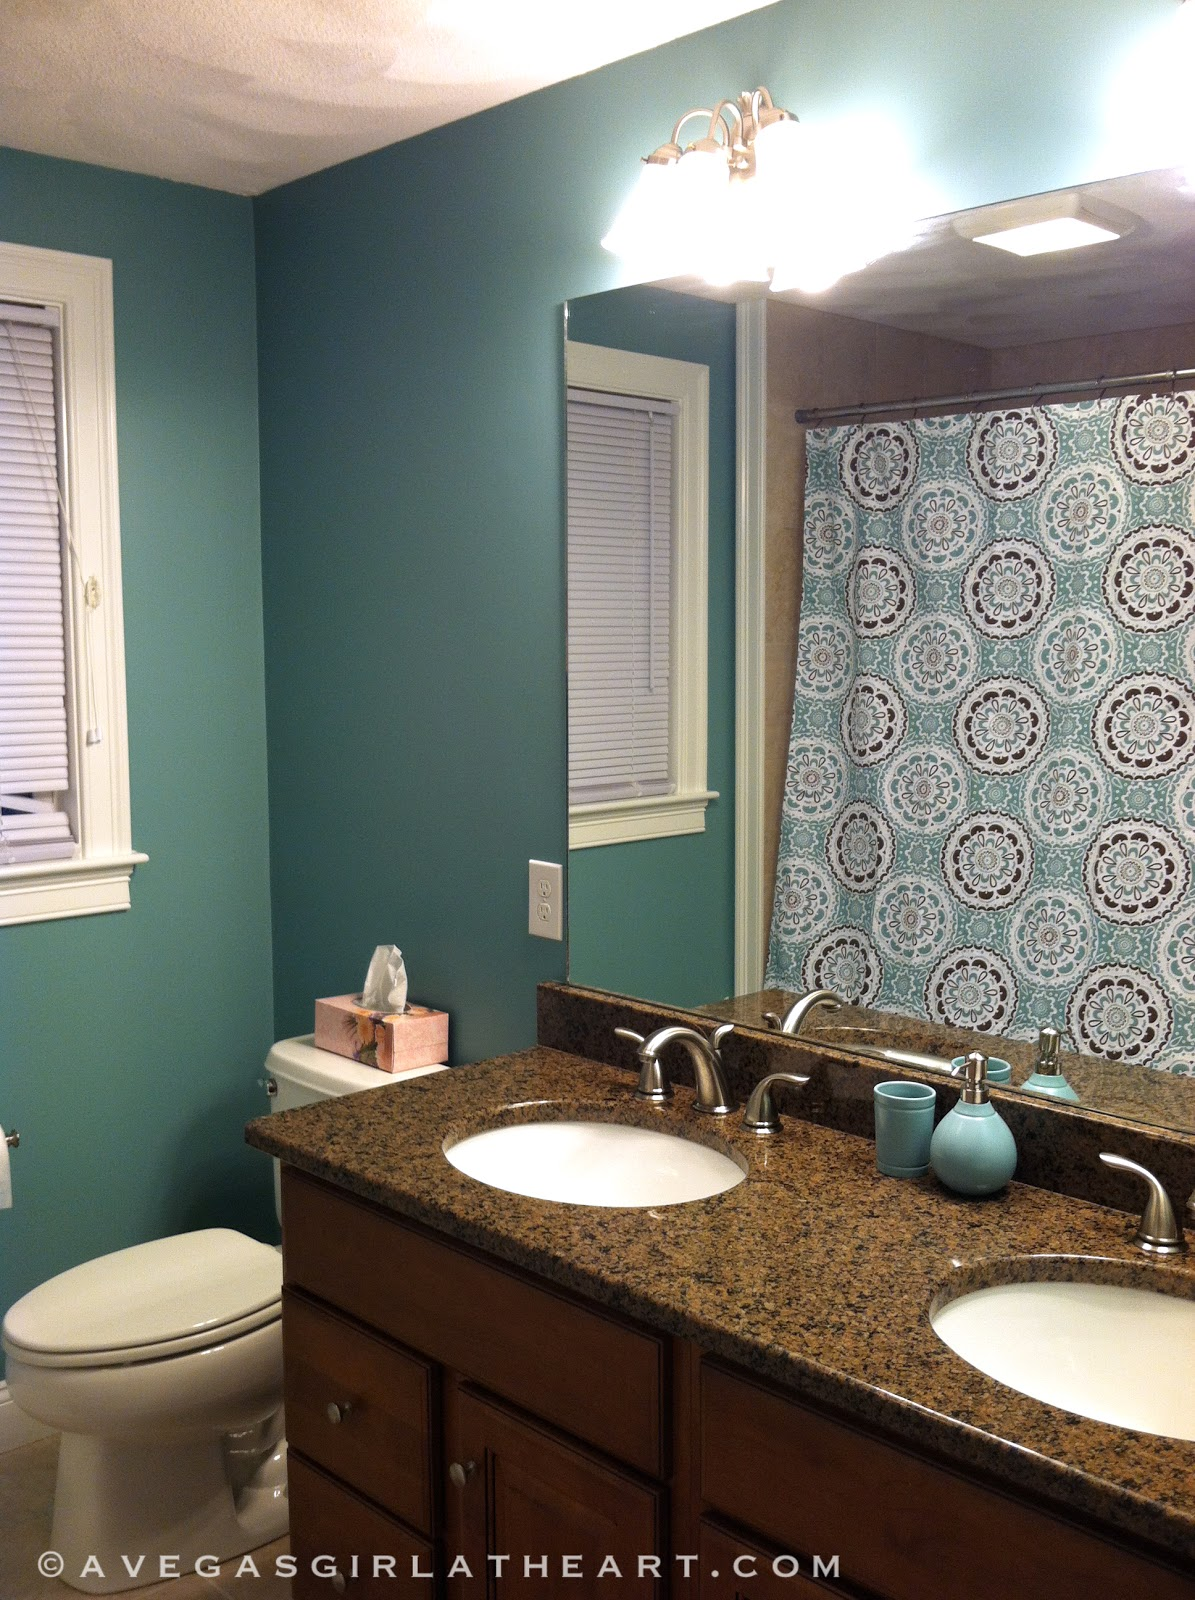 heart product review benjamin moore aura waterborne interior paint. Black Bedroom Furniture Sets. Home Design Ideas